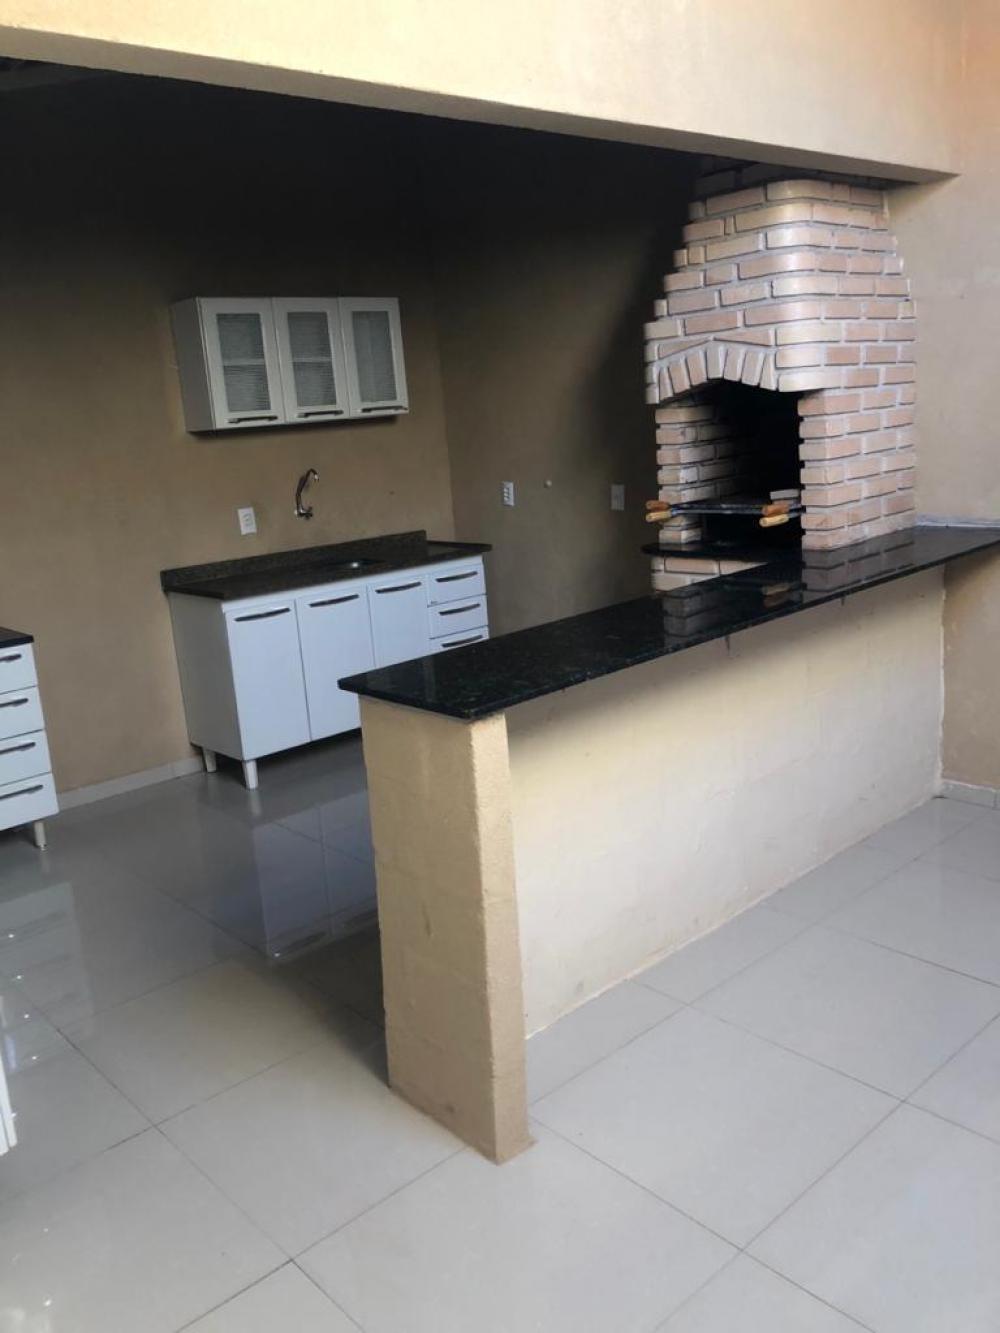 Sao Jose do Rio Preto Casa Locacao R$ 900,00 Condominio R$165,00 2 Dormitorios 2 Vagas Area do terreno 184.48m2 Area construida 51.05m2